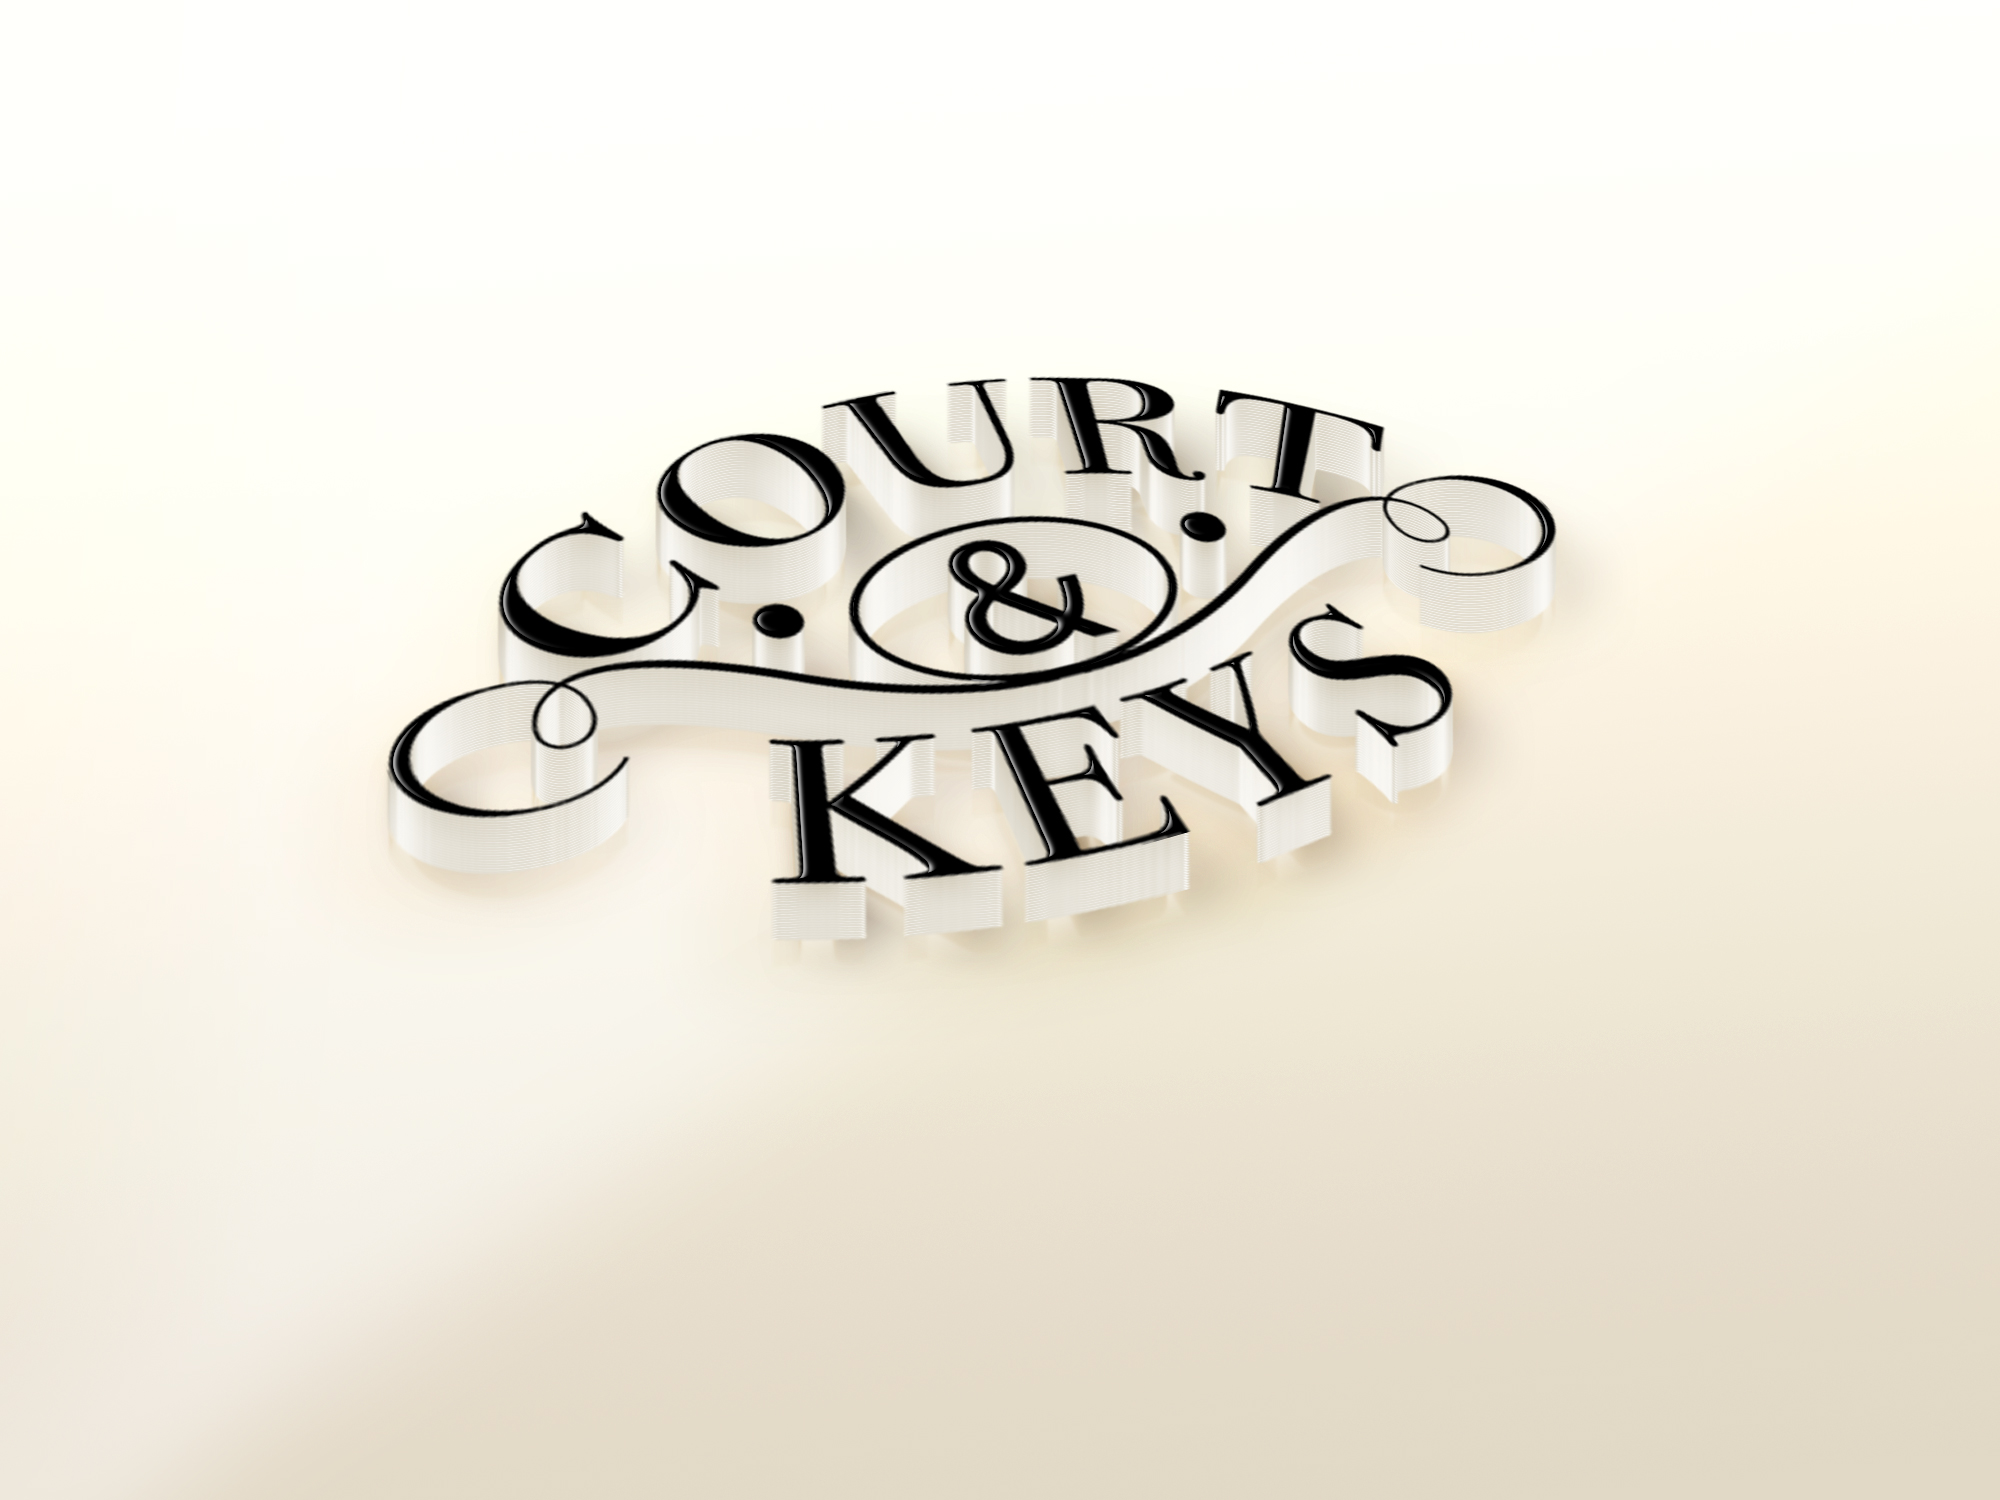 Court-and-keys-marketing-Demo-web-use